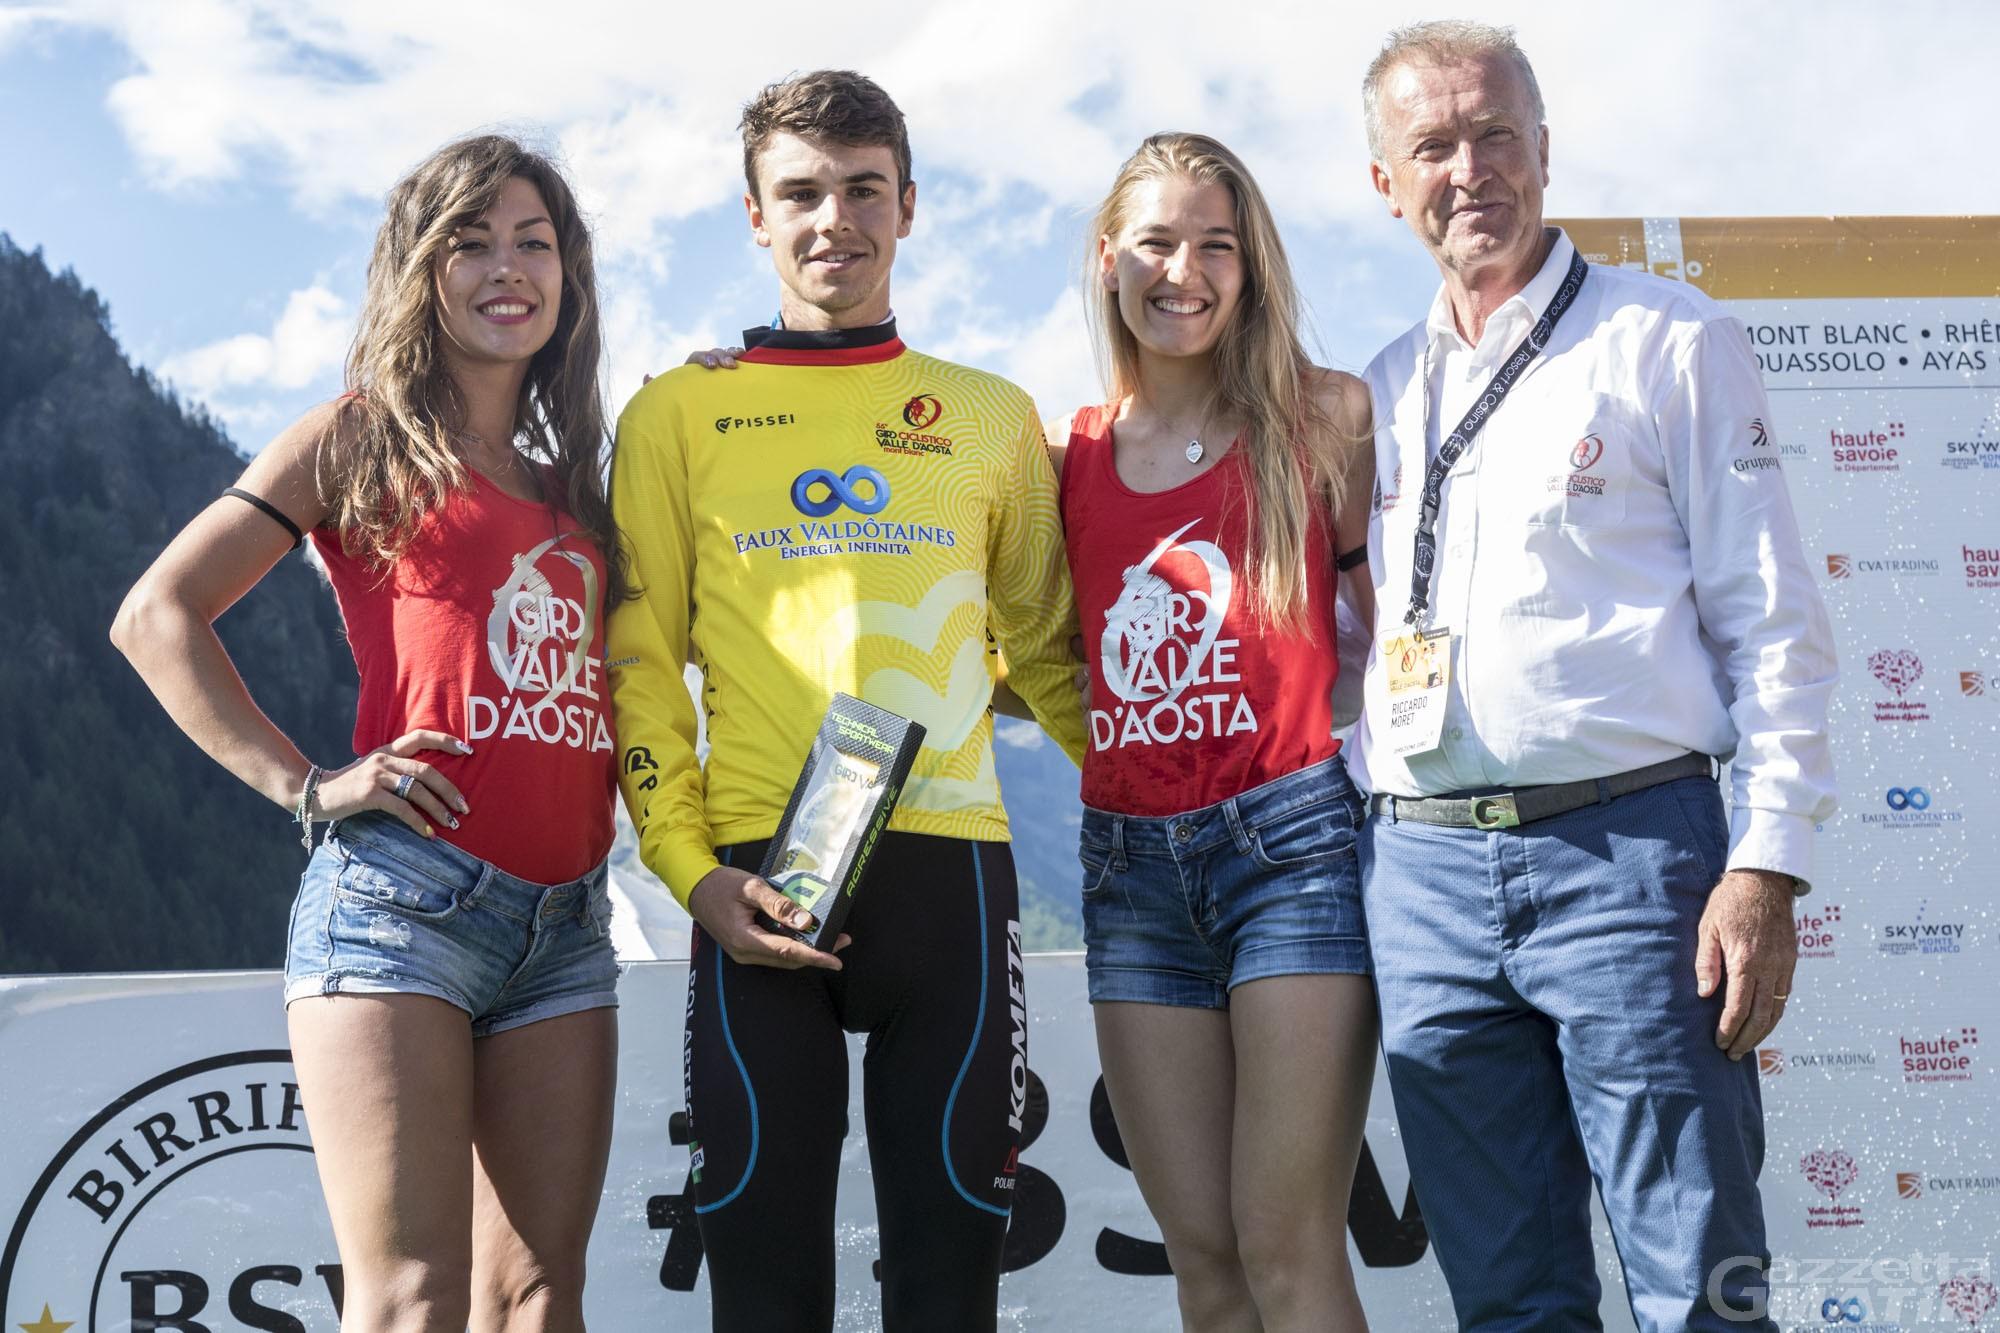 Giro della Valle: il tappone promuove in giallo Inkelaar